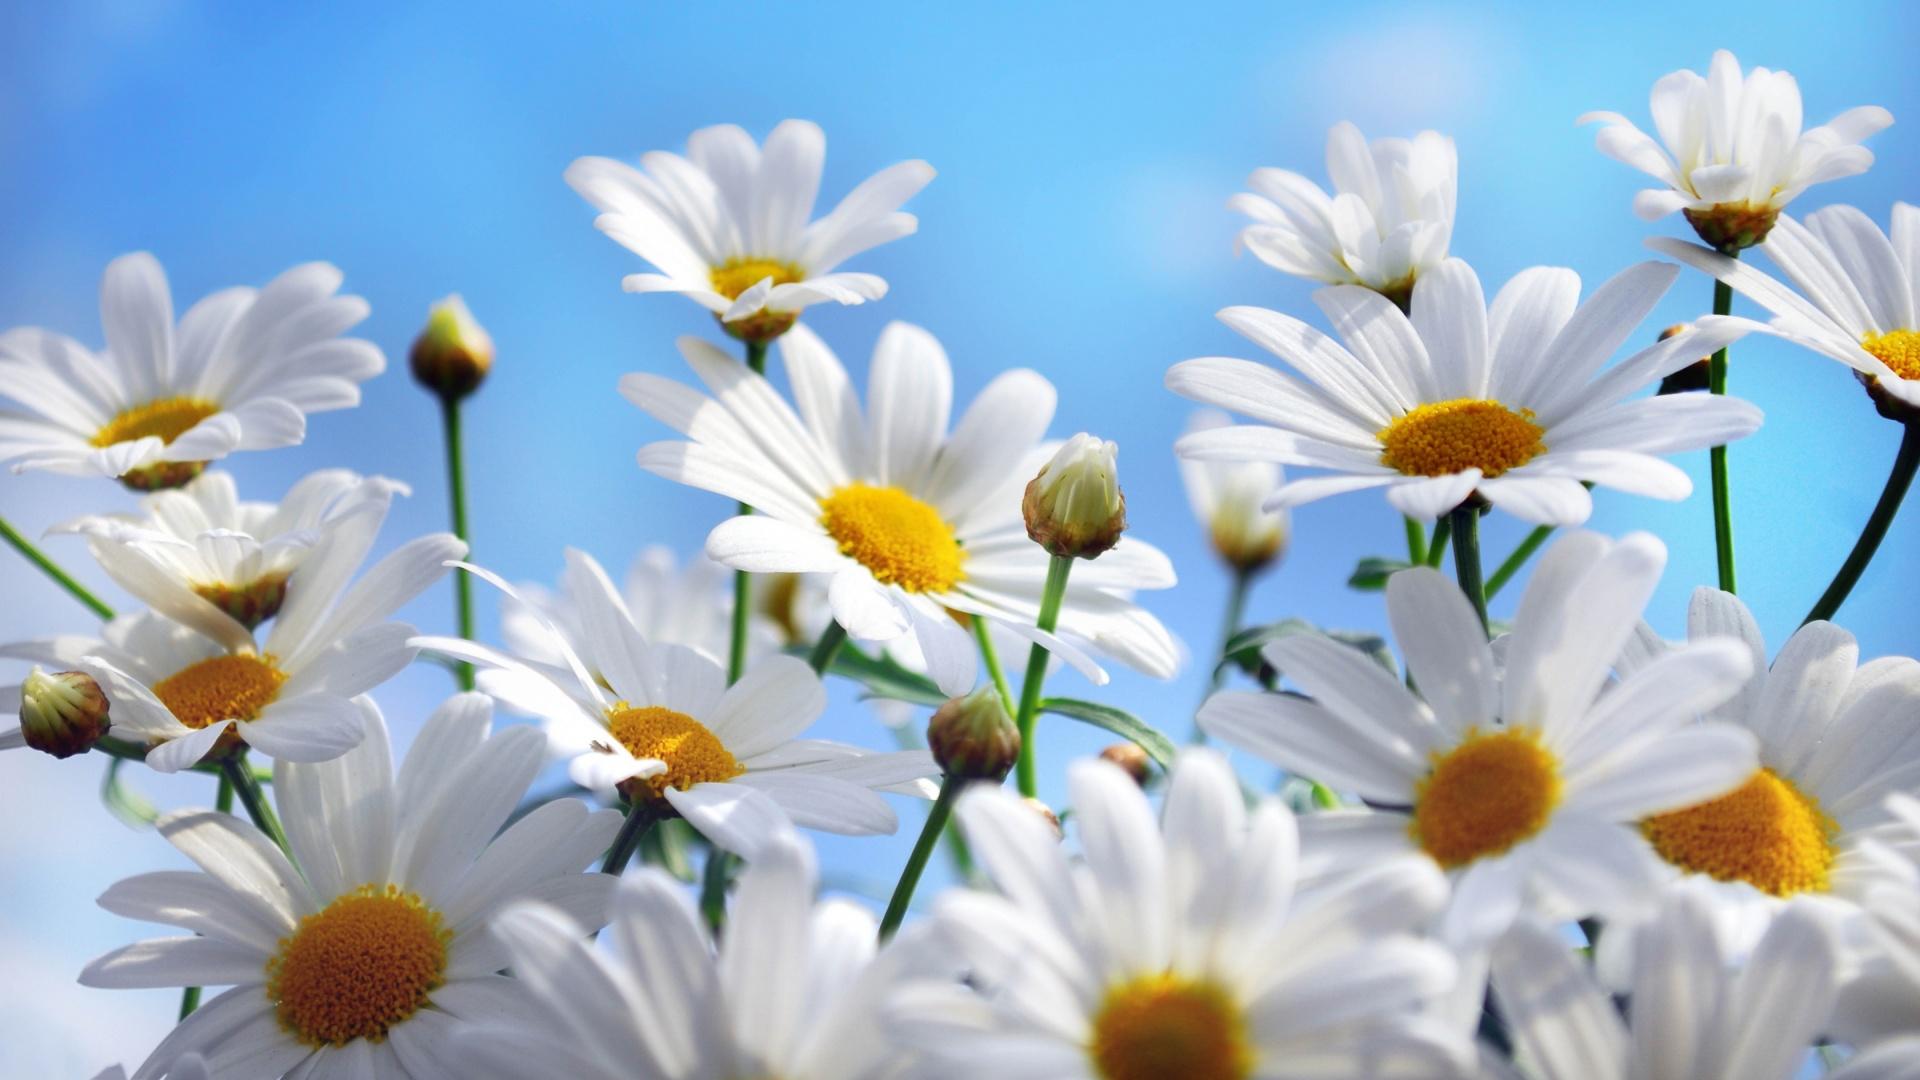 Beautiful Summer Flowers Wallpaper Hd 05